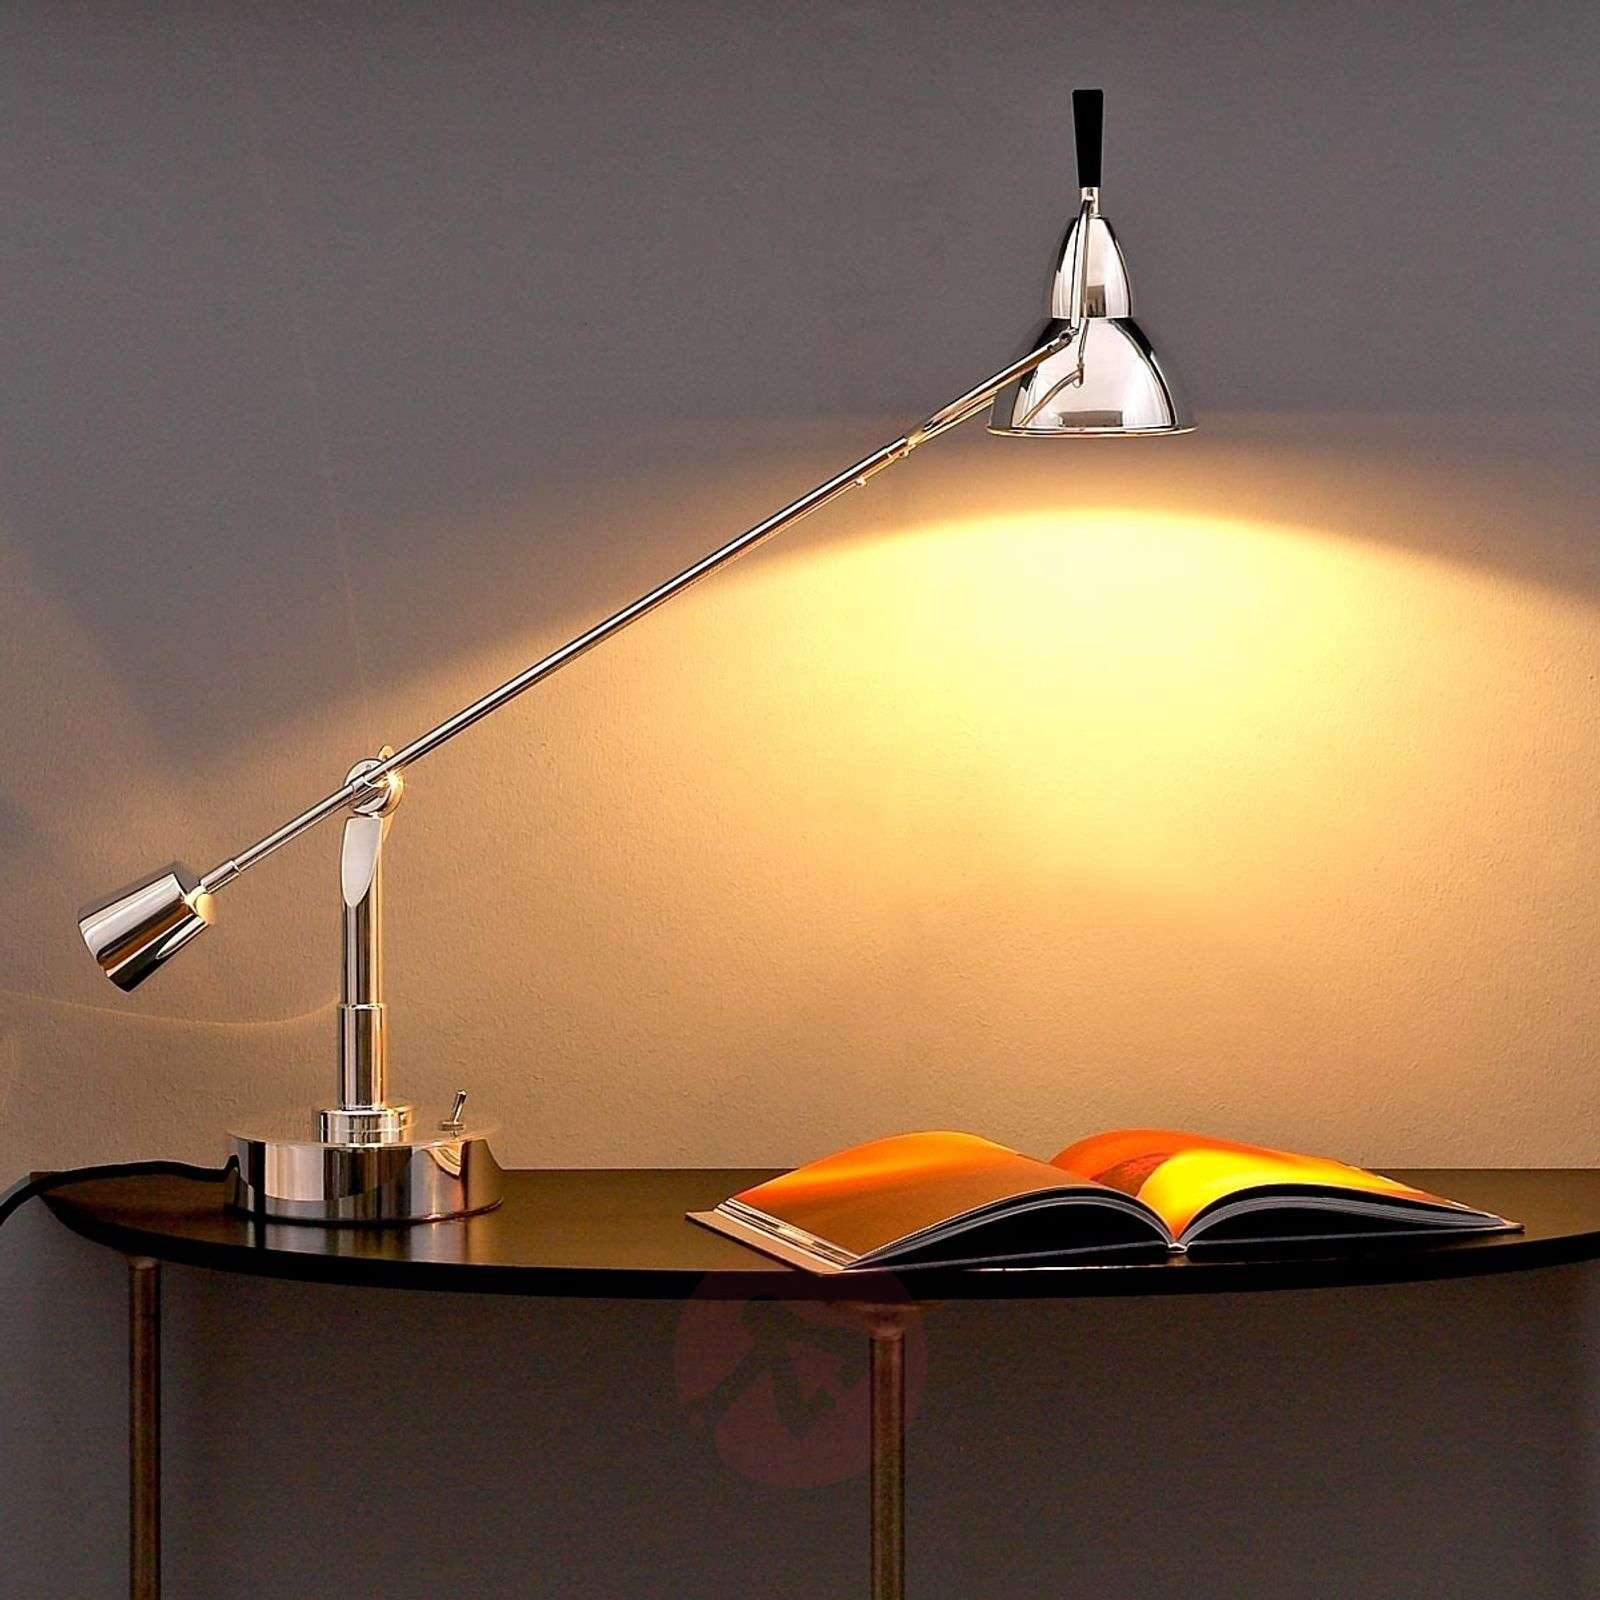 Tecnolumen Buquet table lamp, small-9030012-01